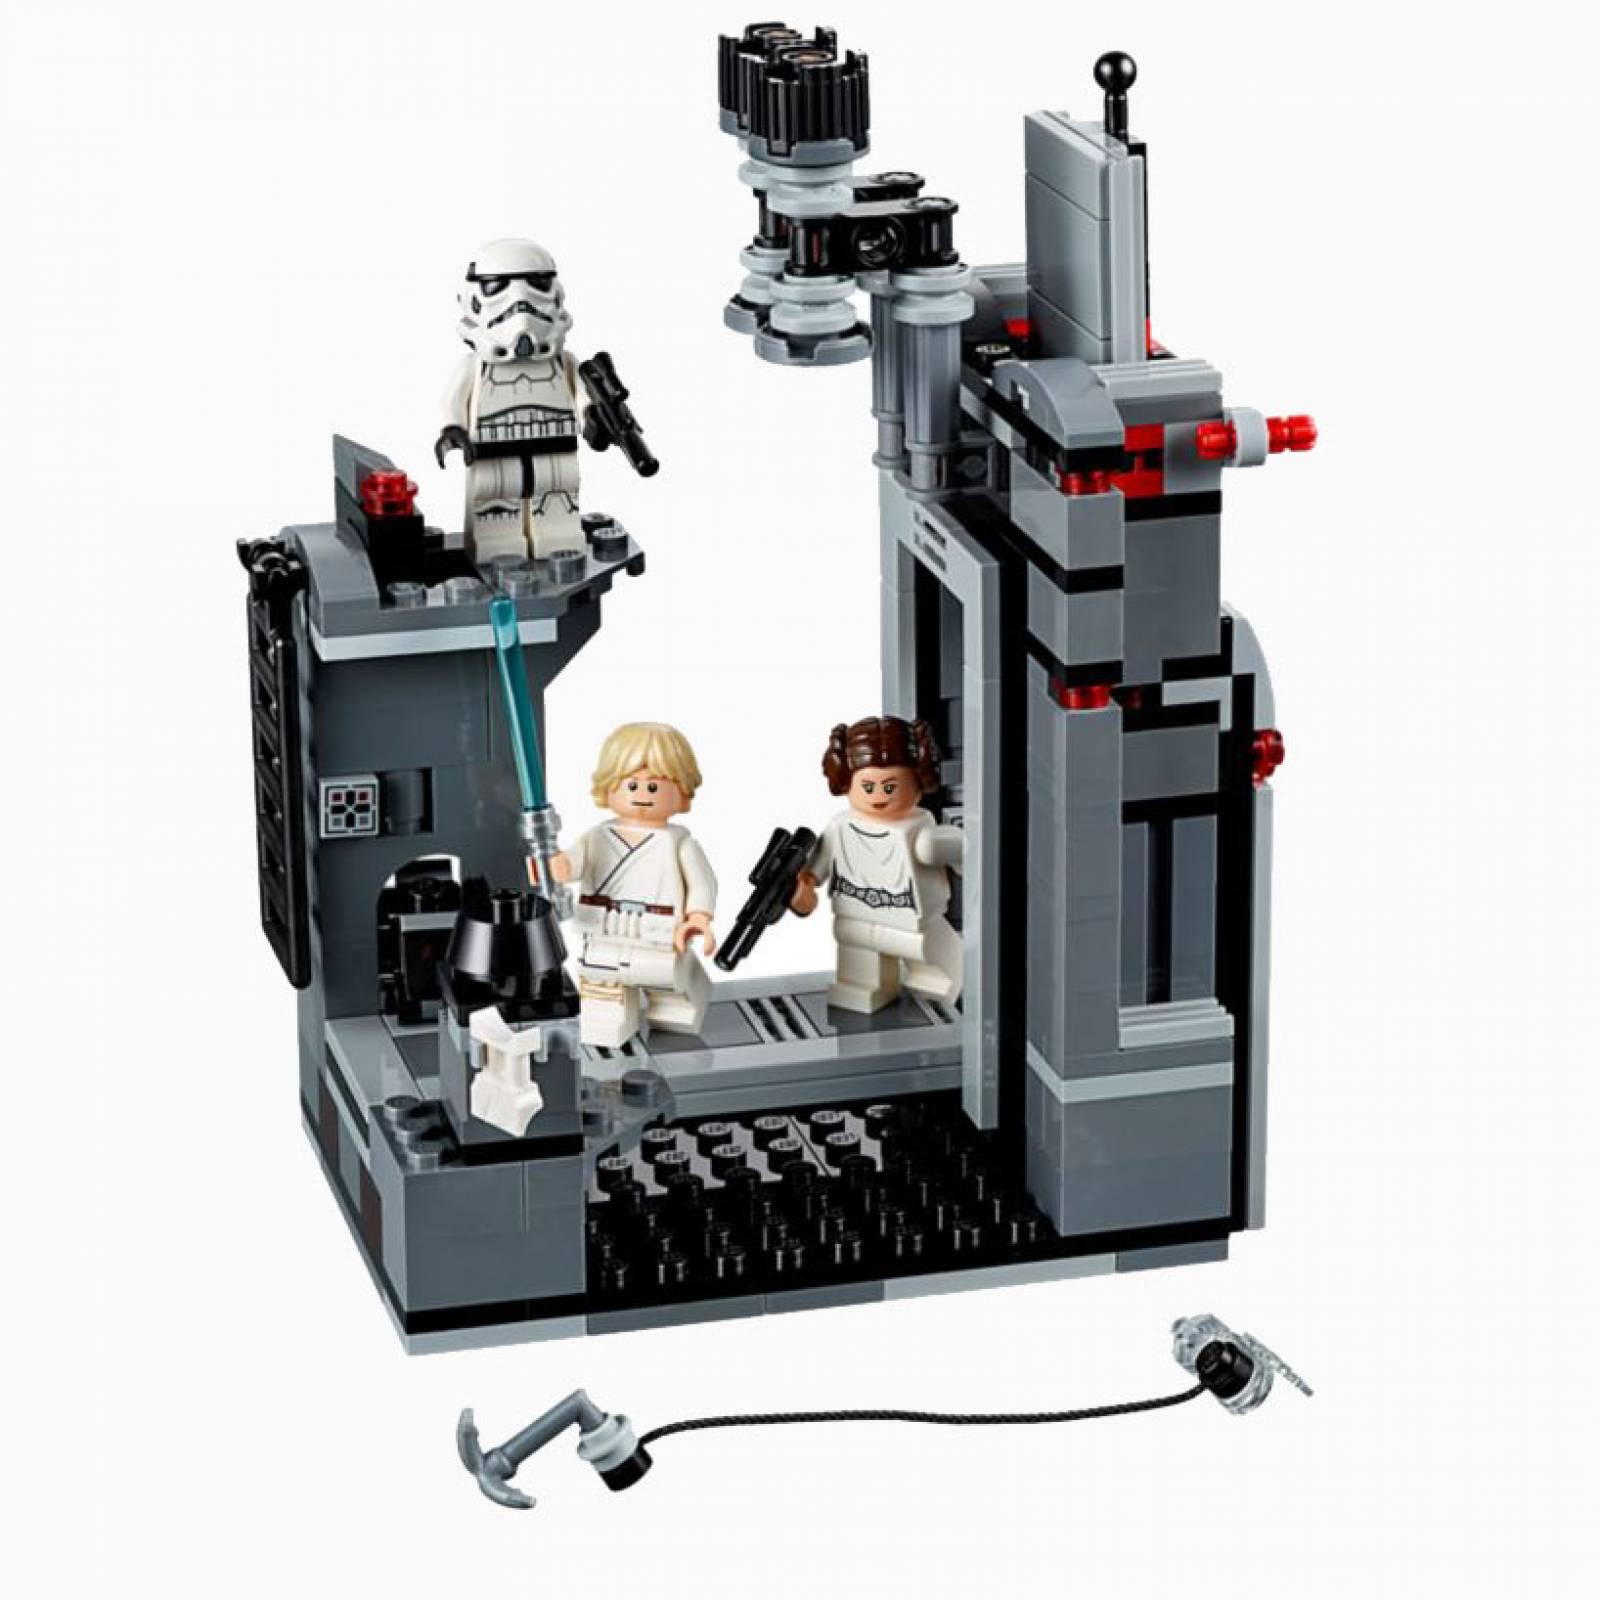 LEGO Star Wars Death Star Escape 75229 thumbnails